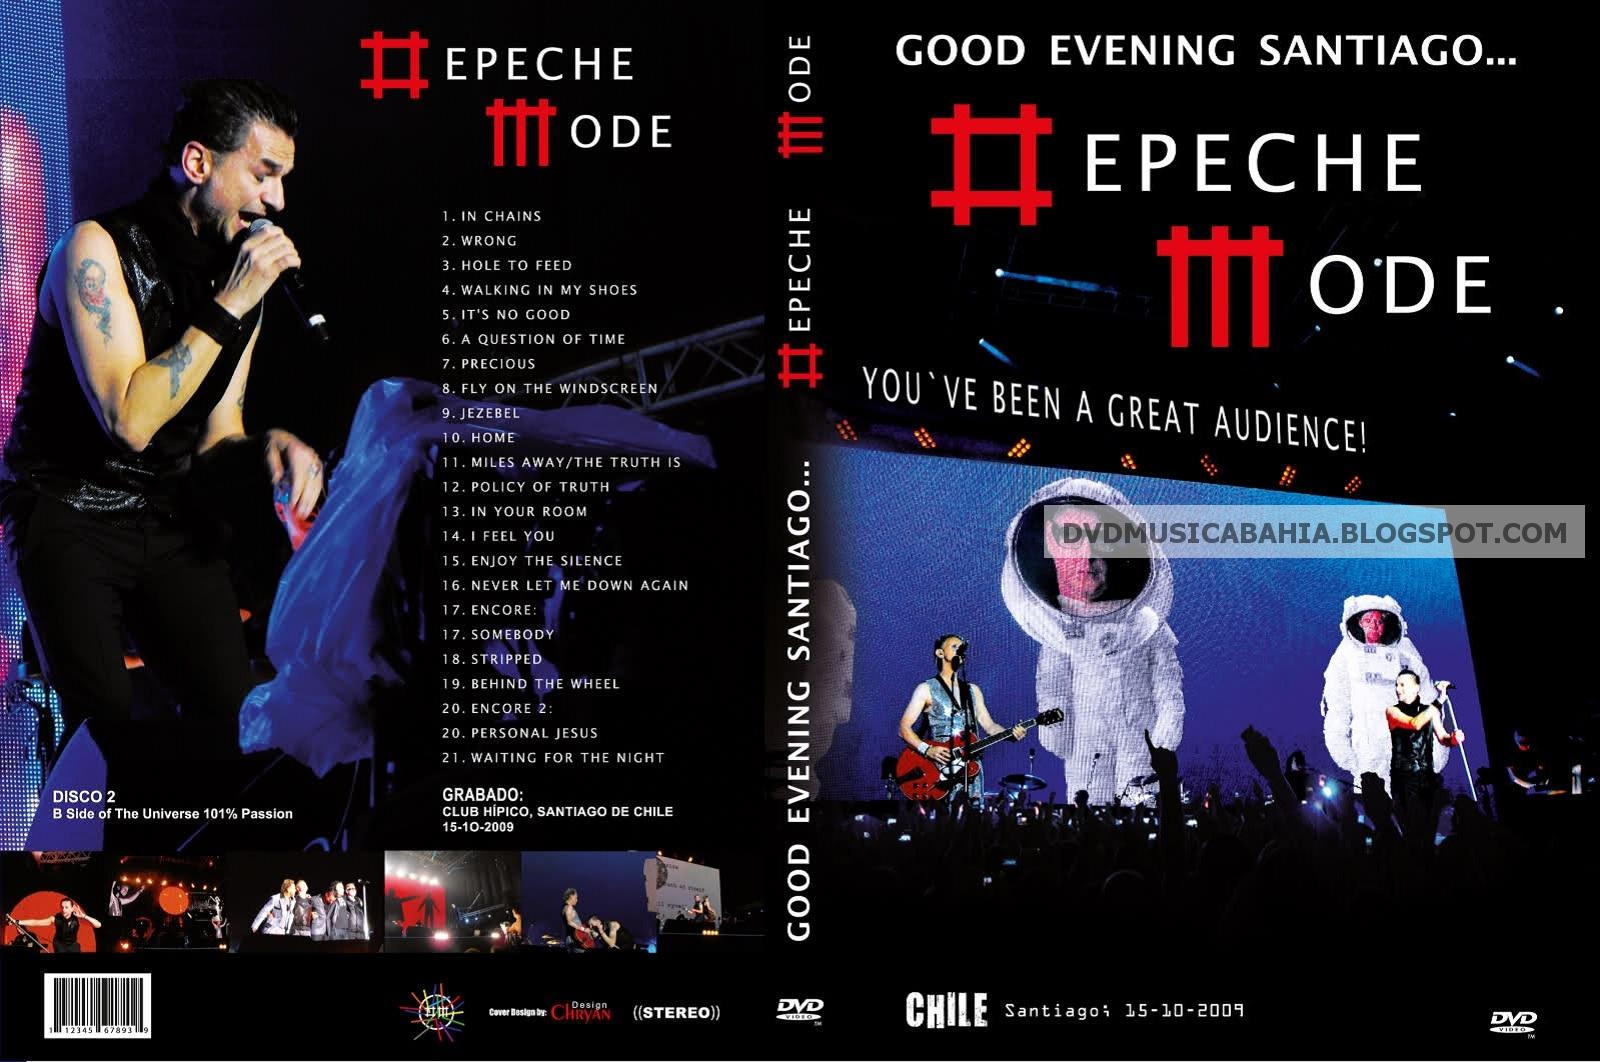 http://1.bp.blogspot.com/-kfsZoflImLk/T_iRkYoidOI/AAAAAAAACLg/evDMRxjIzdo/s1600/depeche+mode+-+live+in+chile+2009.jpg